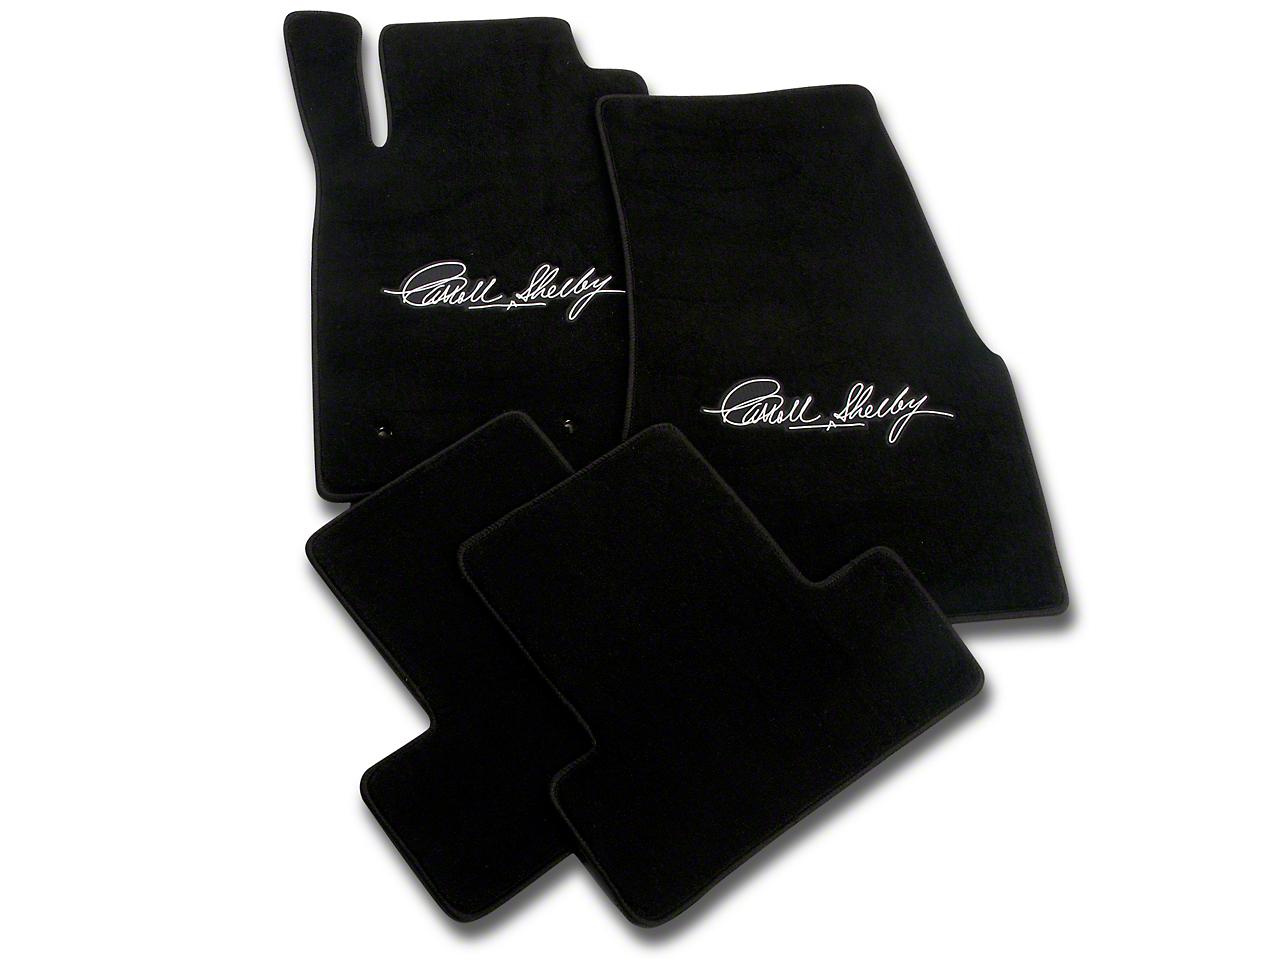 Lloyd Front & Rear Floor Mats w/ Carroll Shelby Signature - Black (05-10 All)